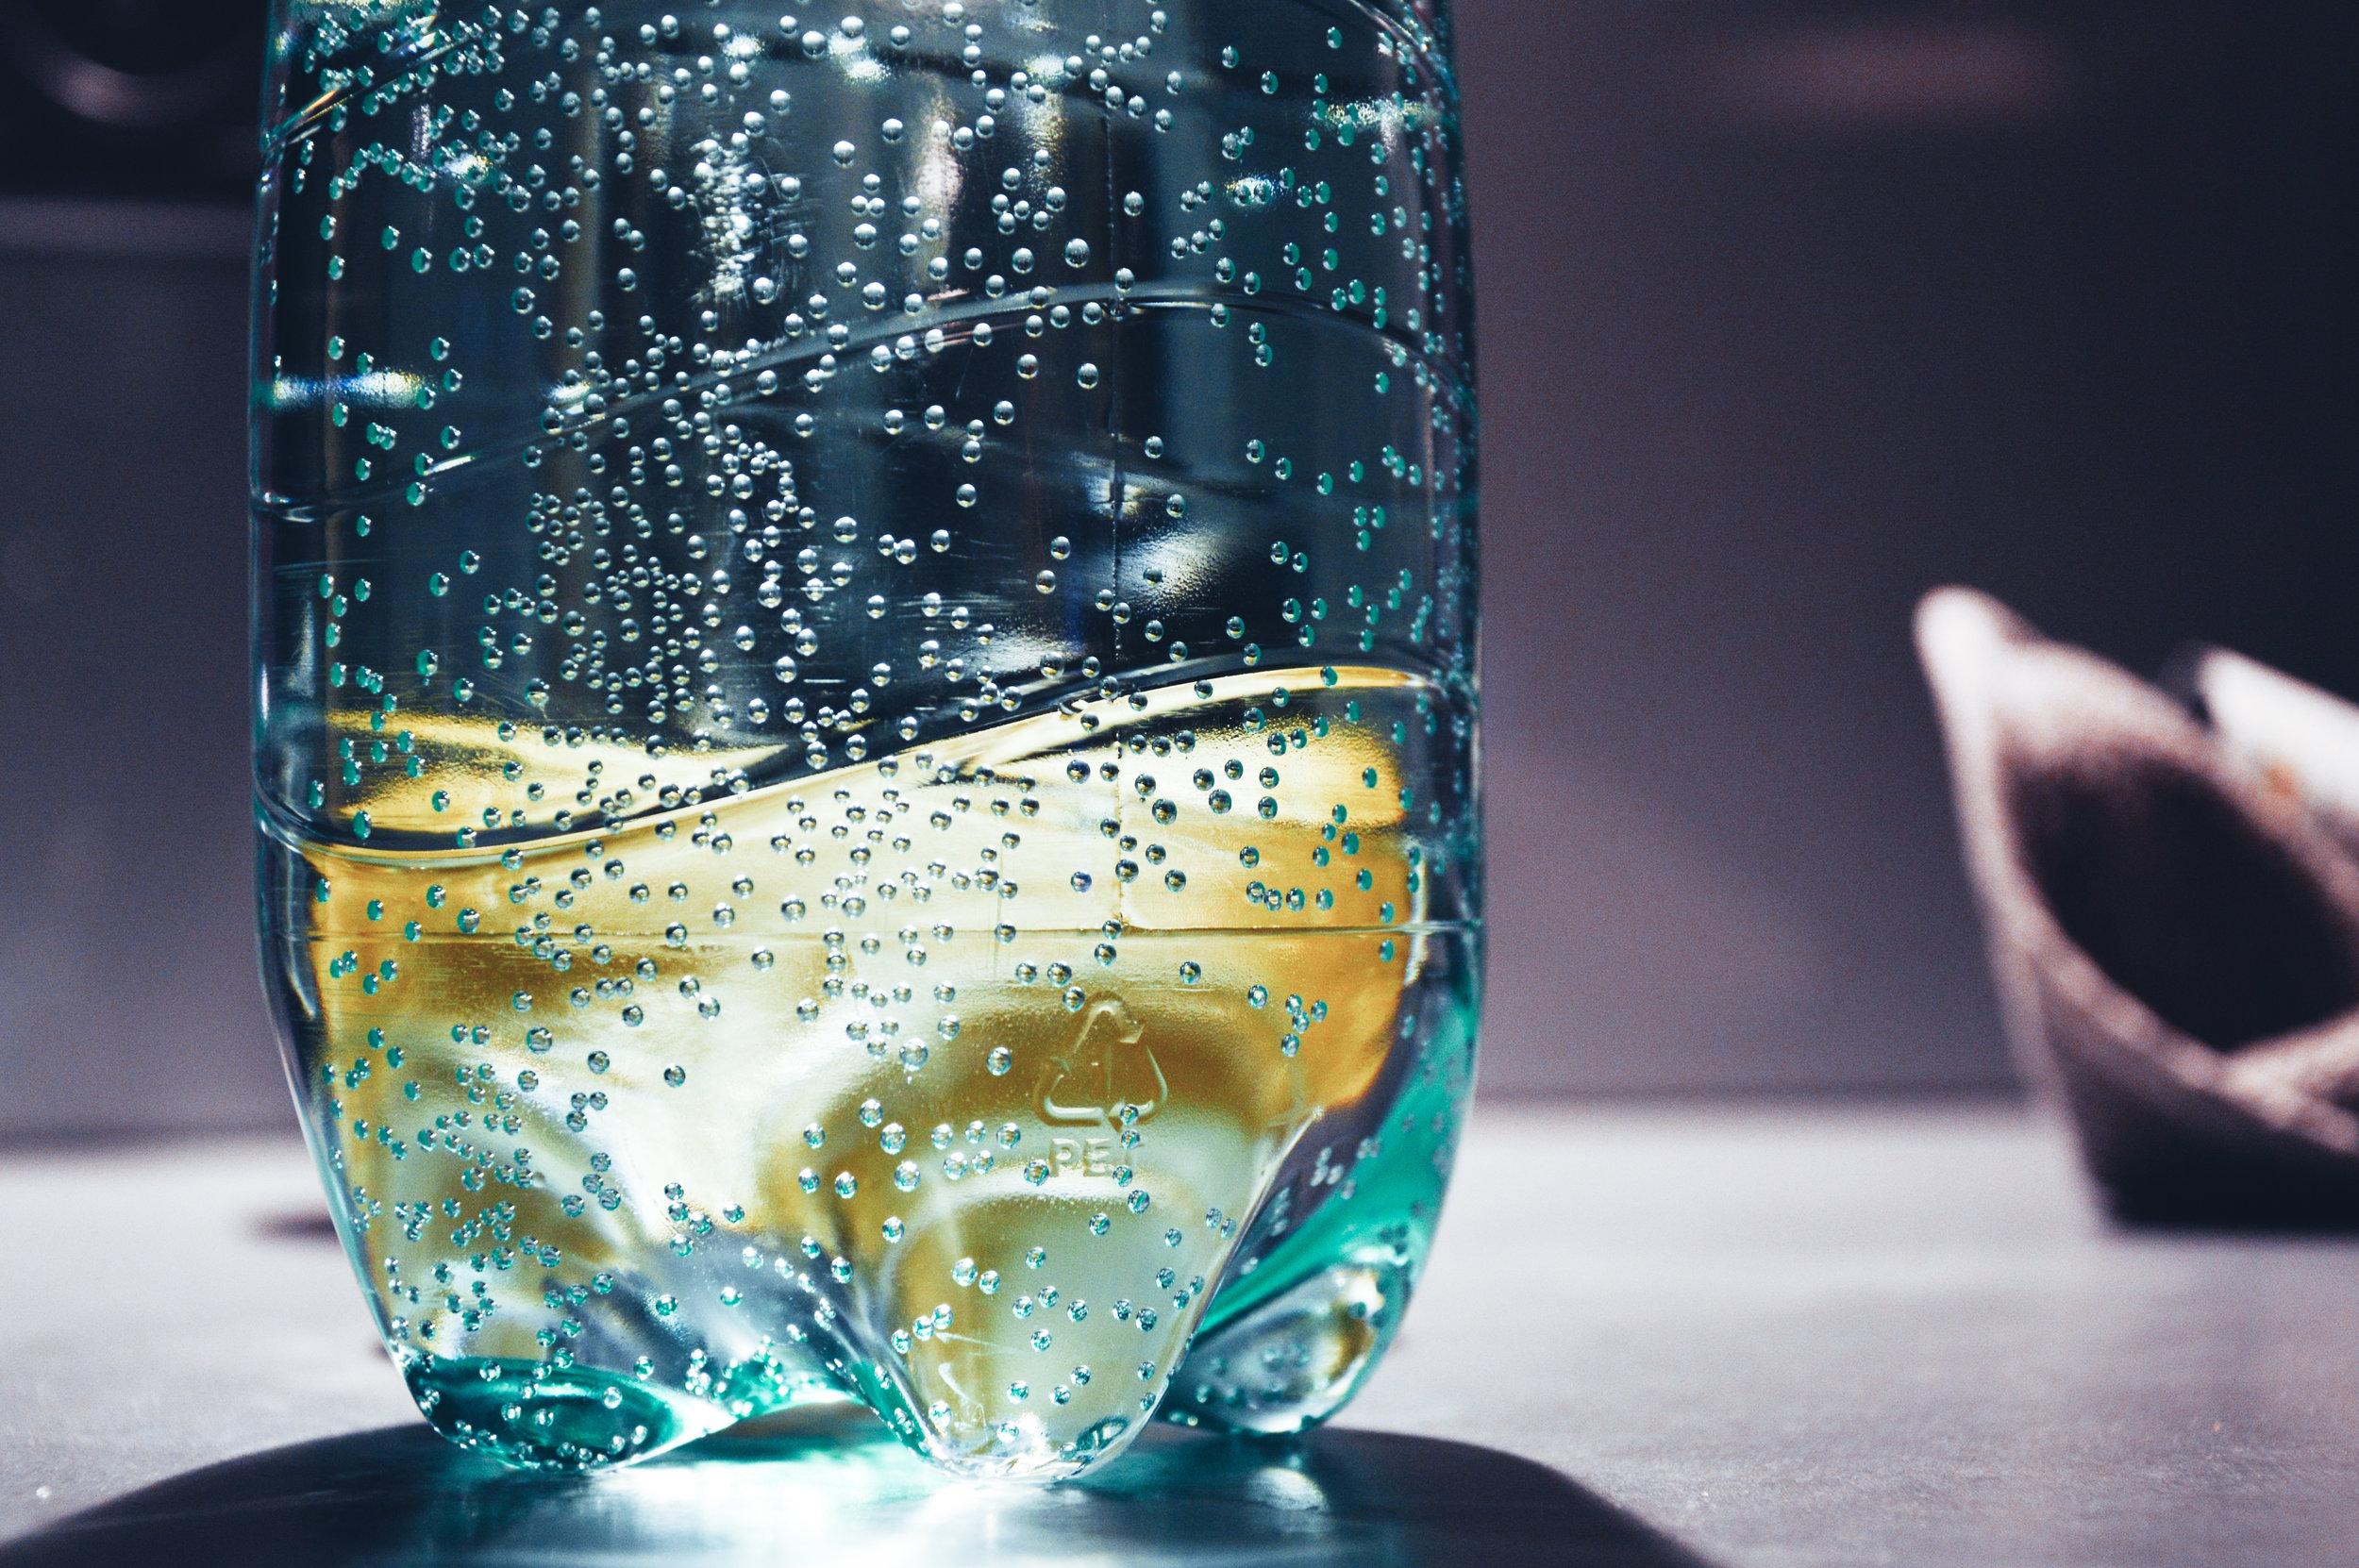 fiji water case study analysis